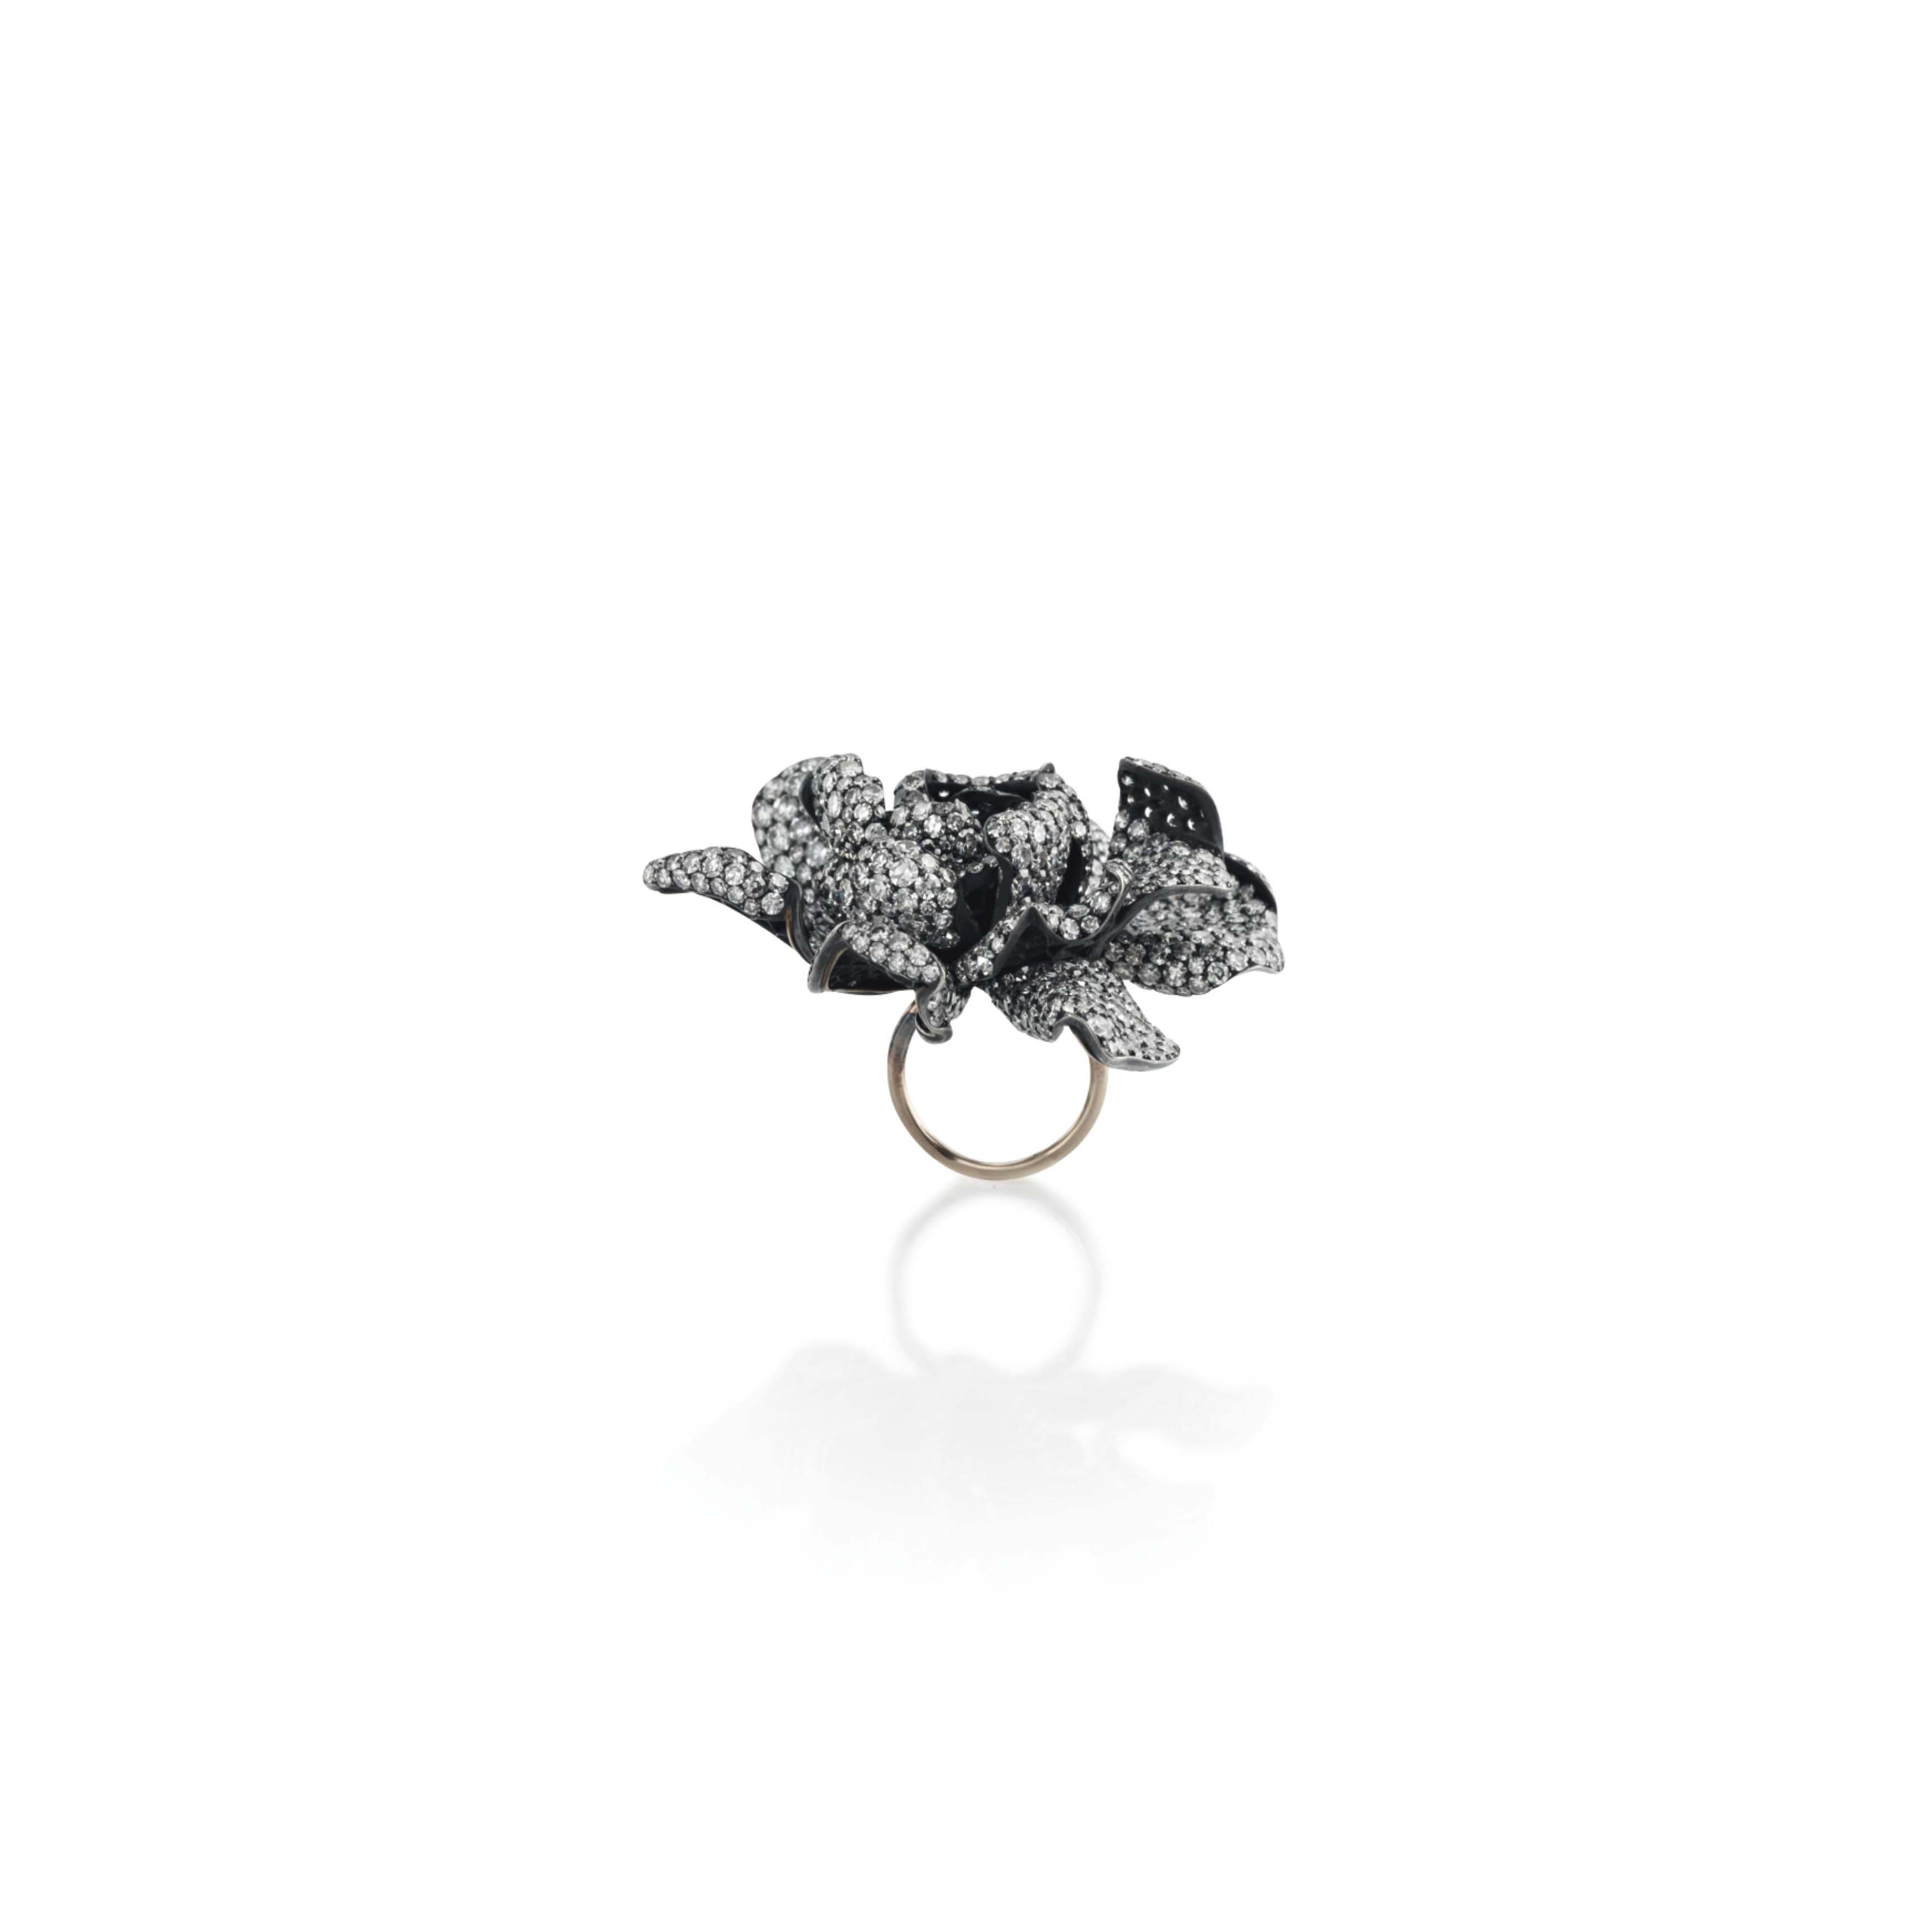 A DIAMOND 'GARDENIA' RING, BY